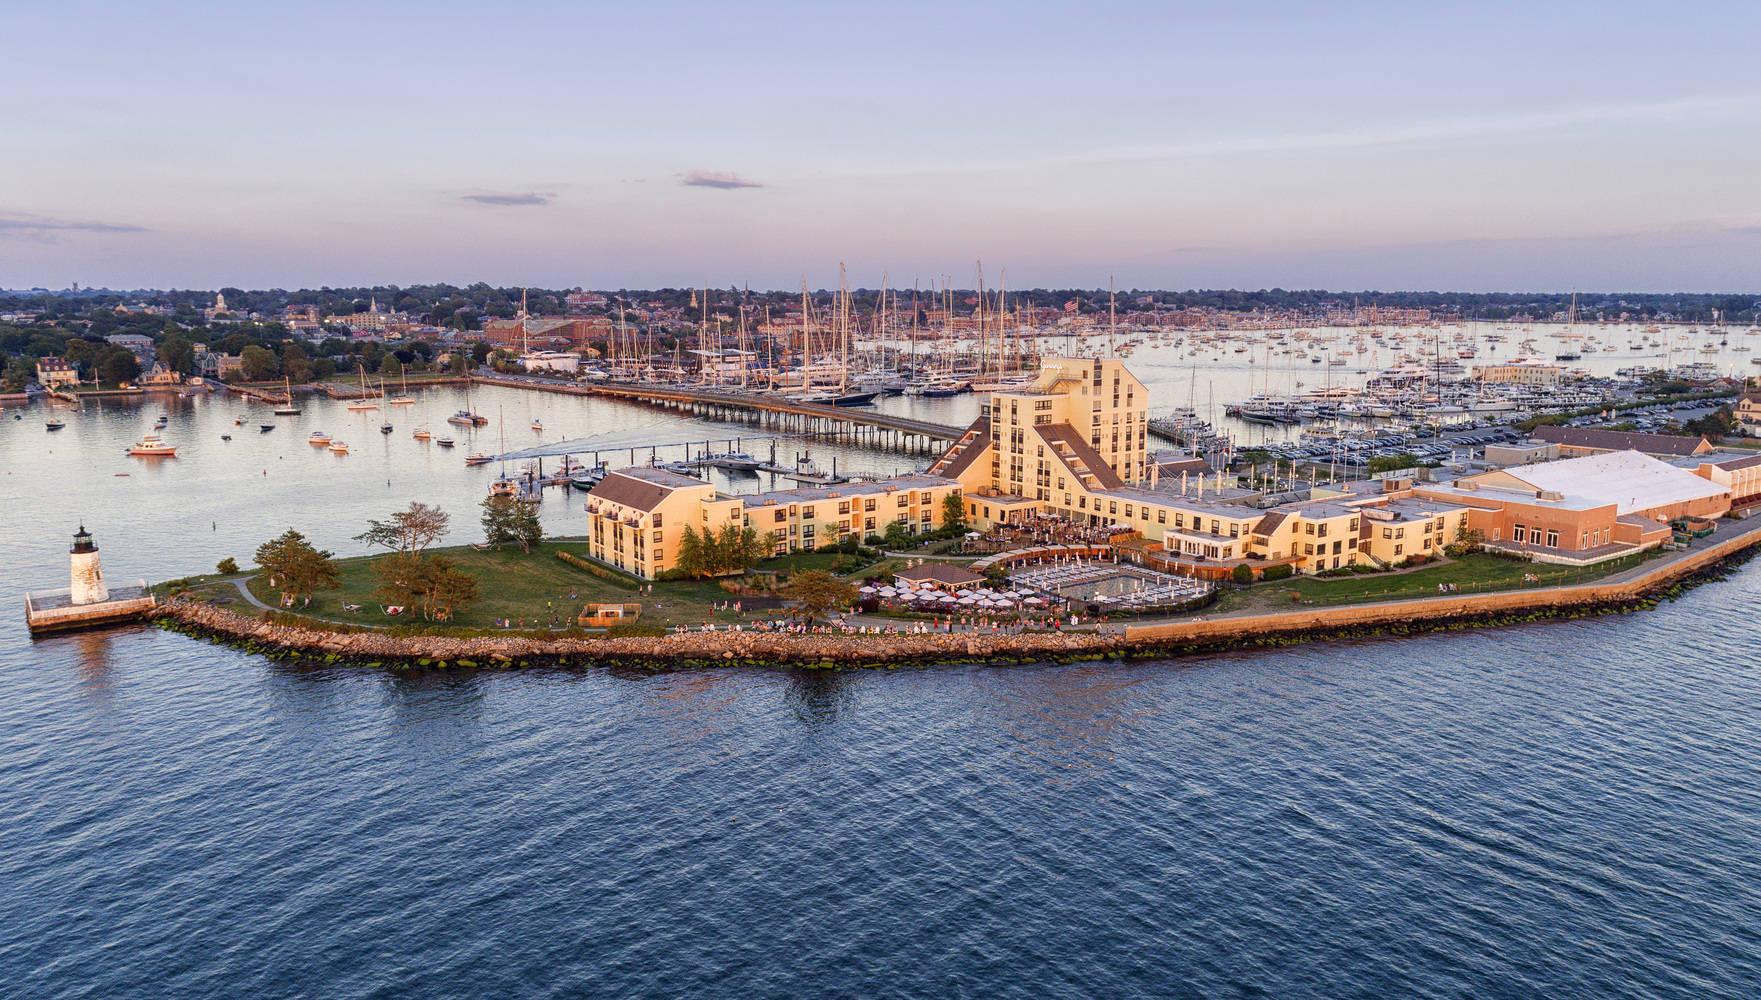 Gurney's Newport Marina